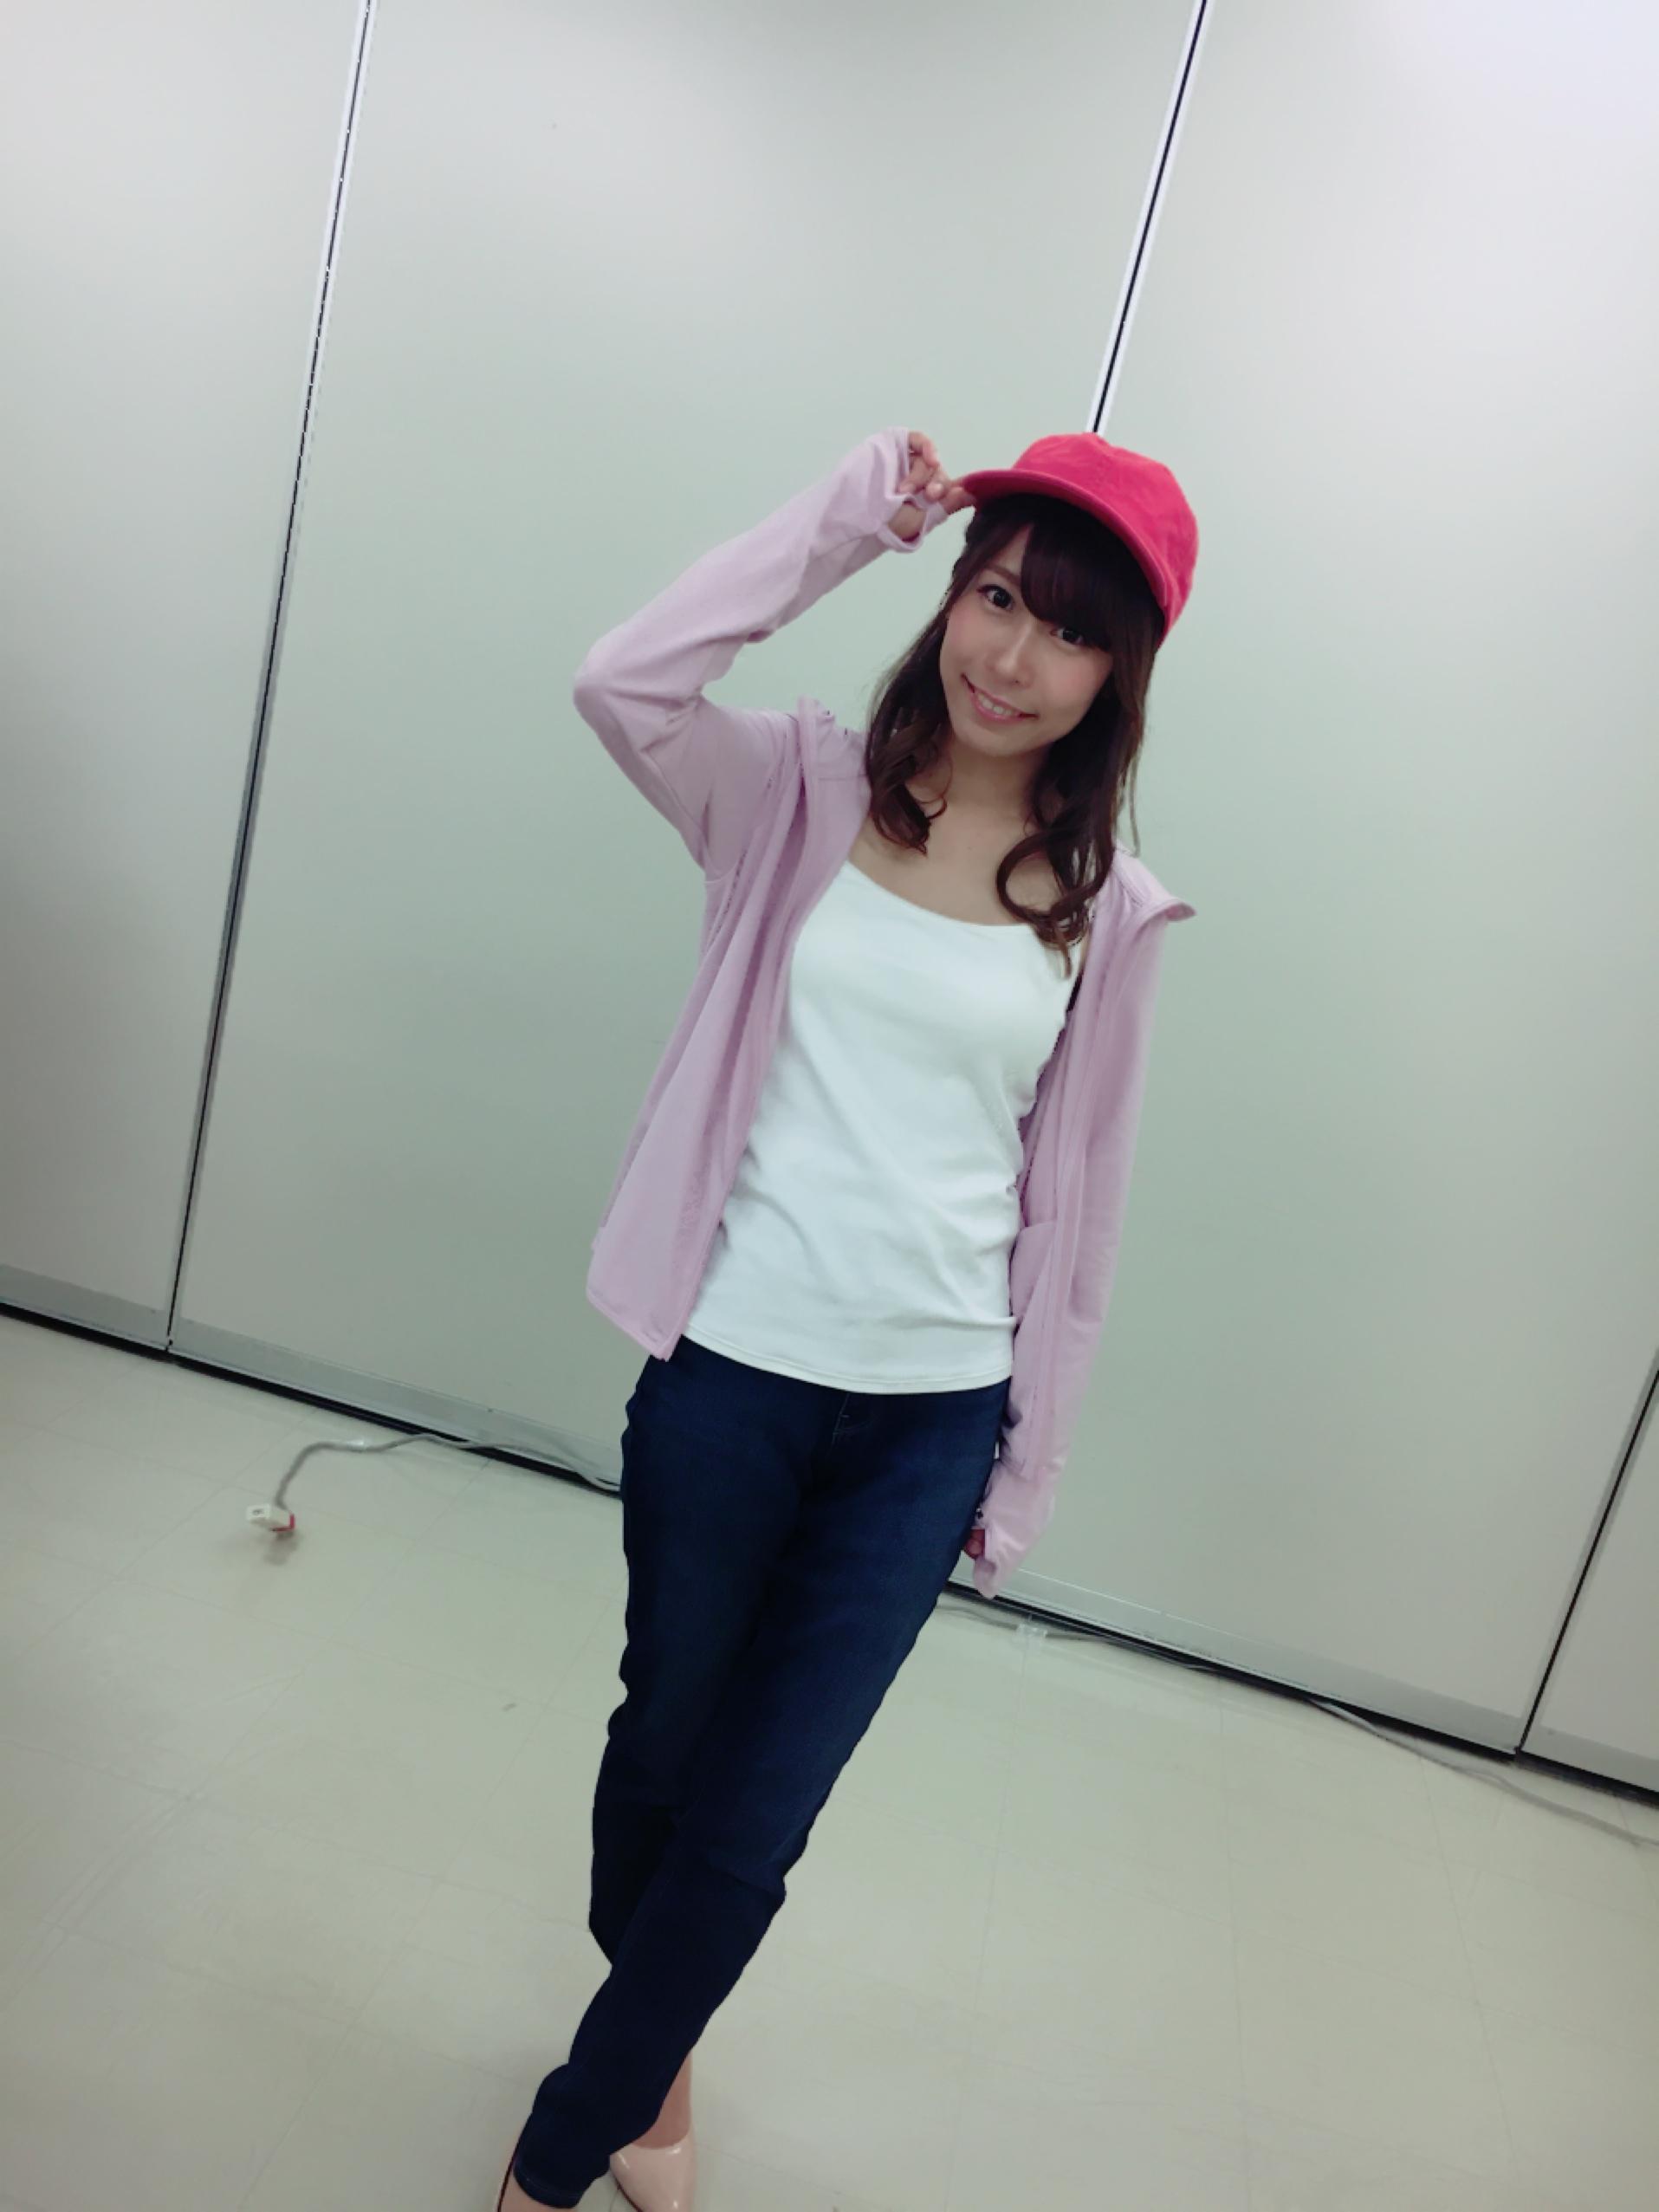 https://emifull.jp/emifulls_blog/11th/uploads/CD701860-73A9-43B0-A5DF-C7B4D43A475B.jpeg